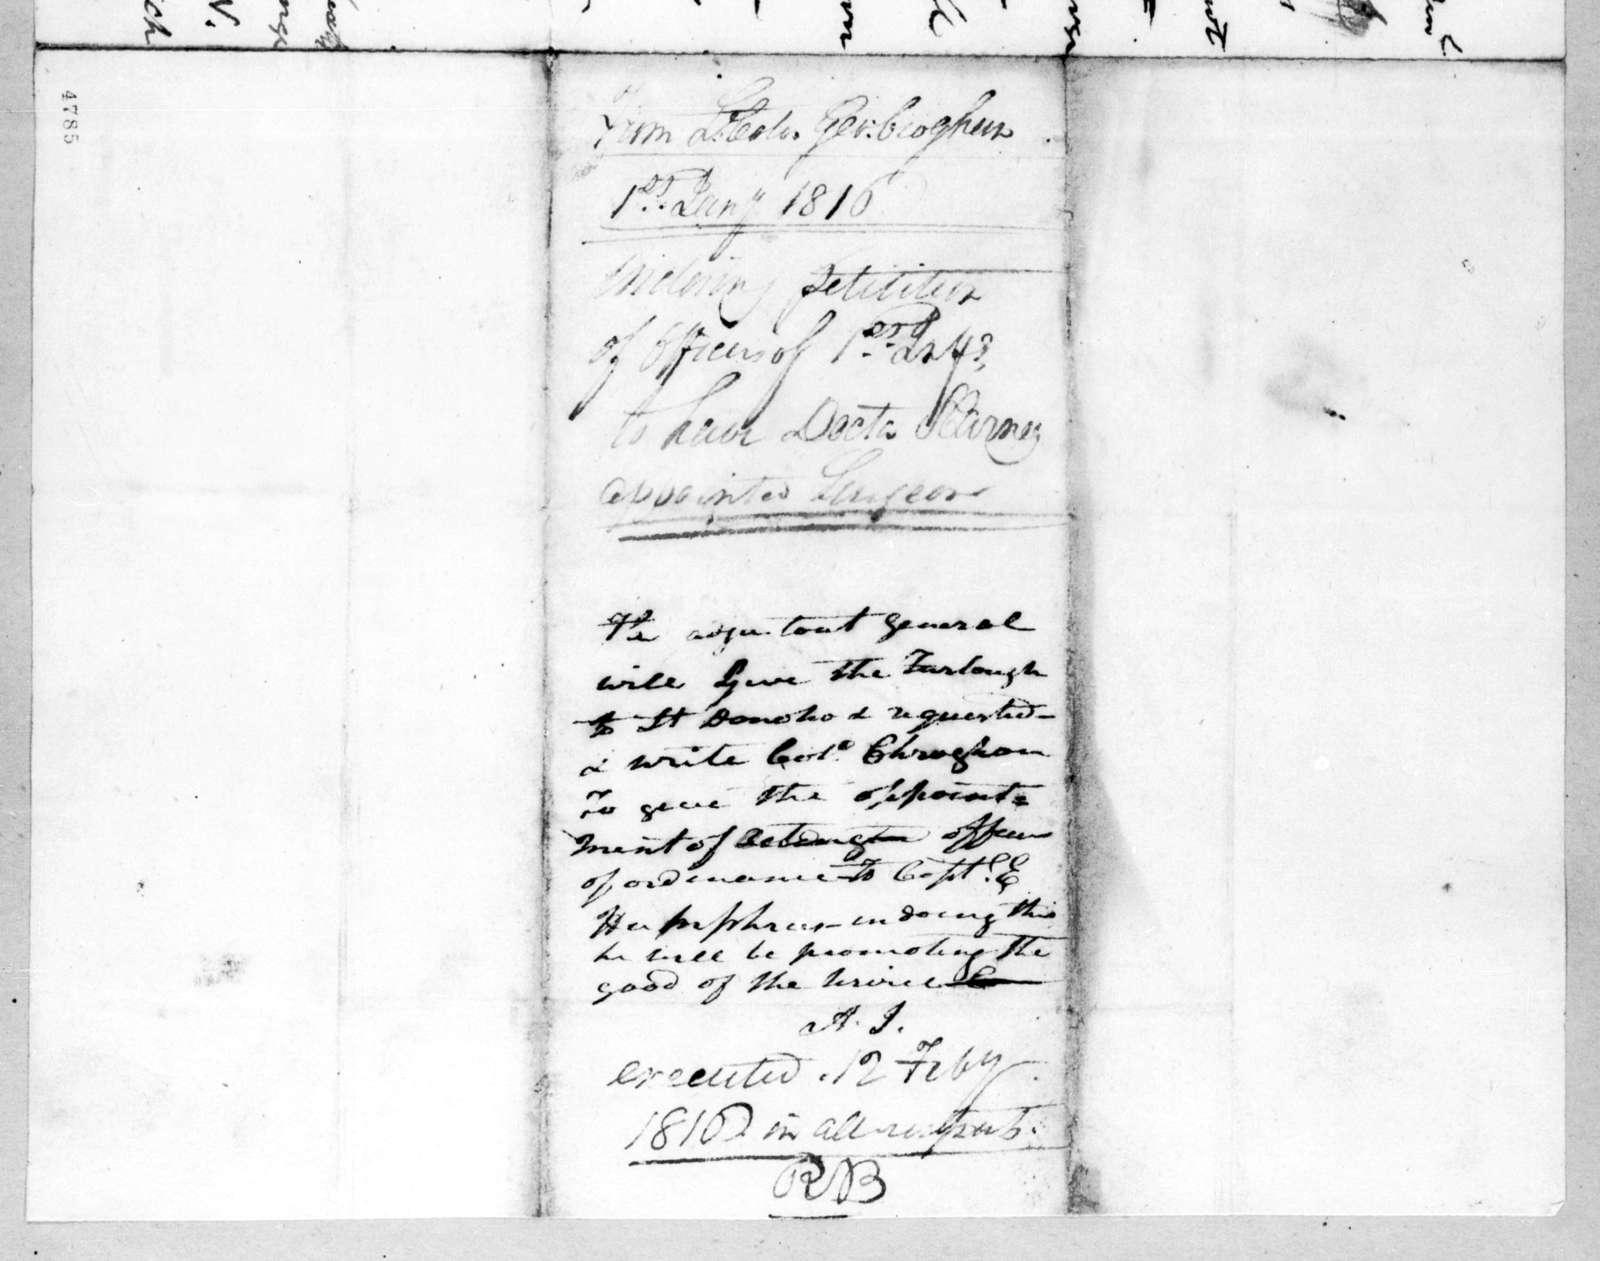 George Croghan to Andrew Jackson, January 1, 1816